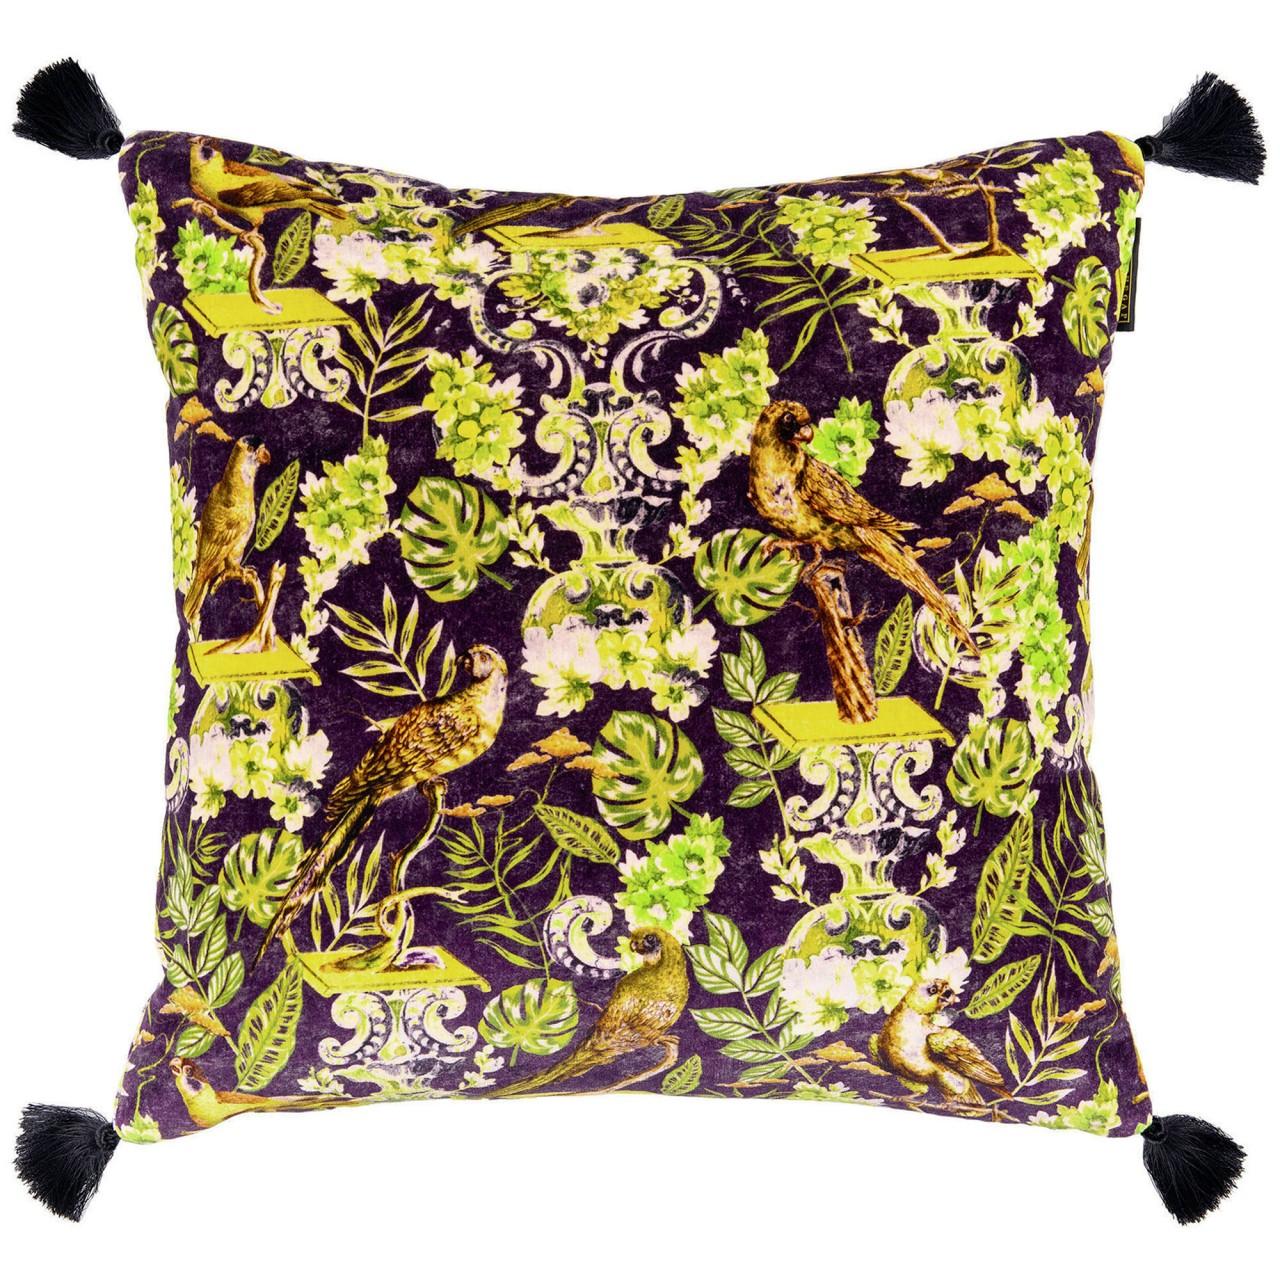 MANOR CREST Velvet Embroidered Cushion